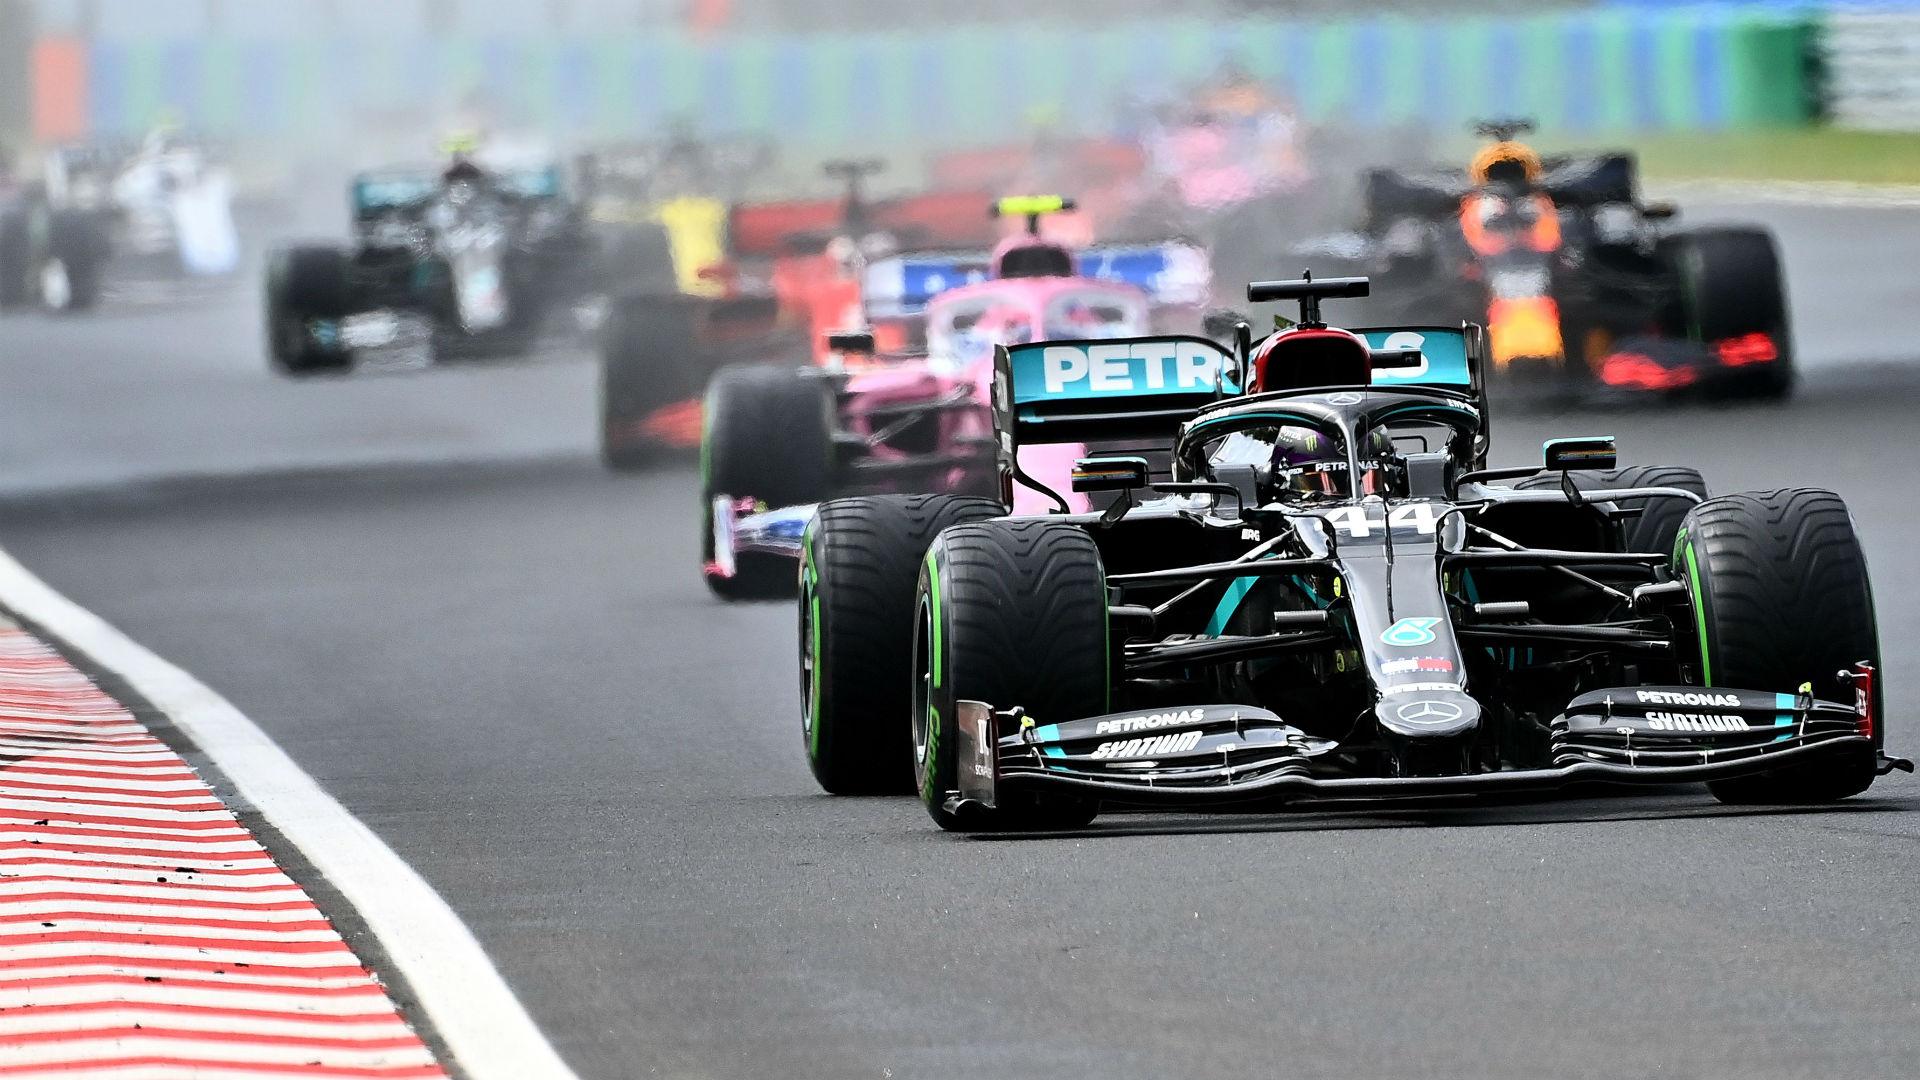 Formula 1 drivers and teams 2021: Aston Martin returns, Renault rebrands for new F1 season